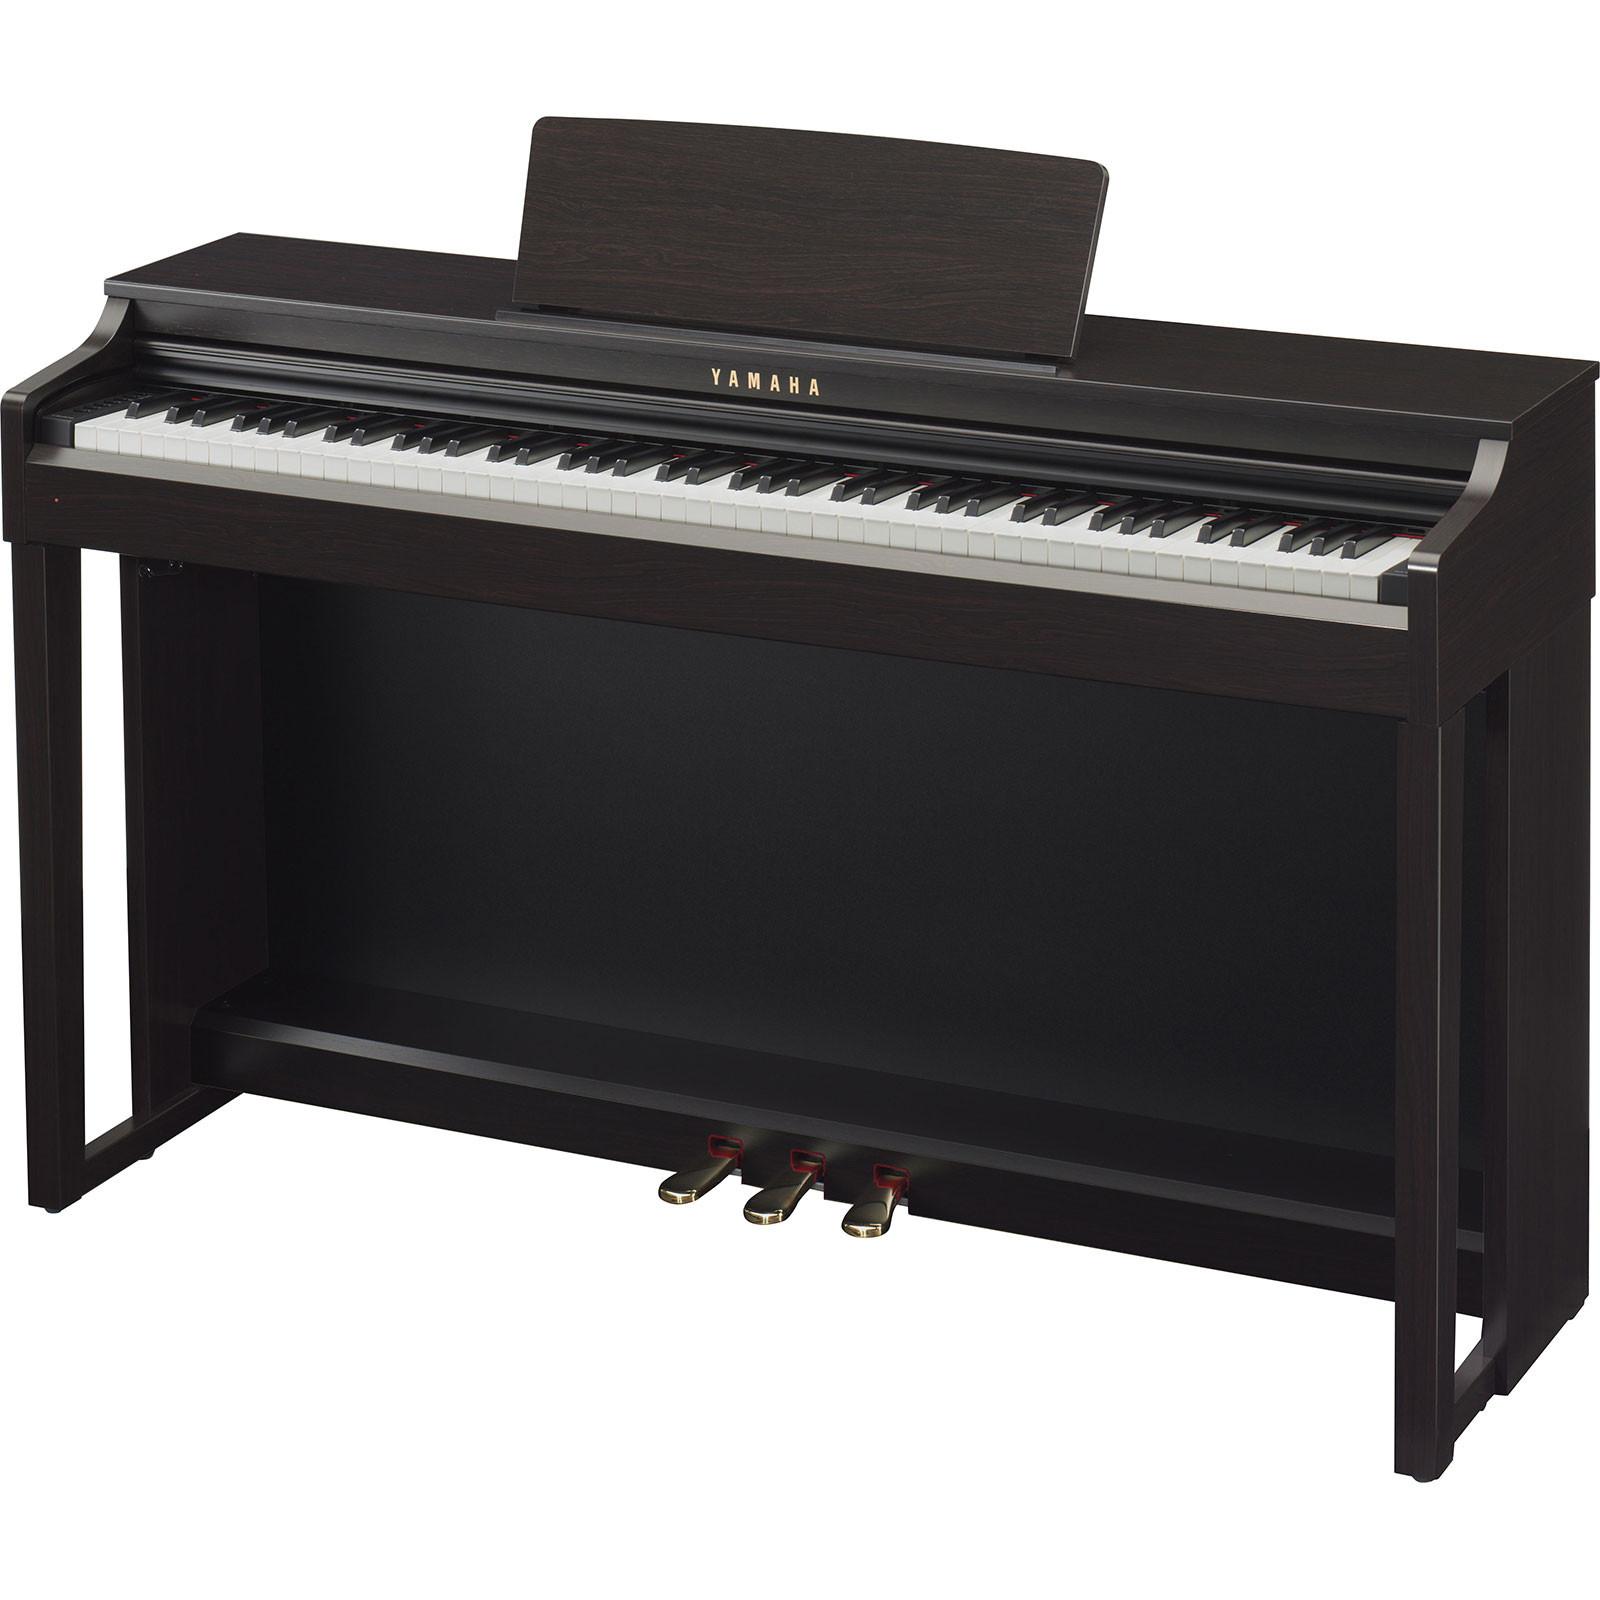 YAMAHA CLP625 CLAVINOVA PIANO PIANOFORTE DIGITALE CON MOBILE 88 TASTI PESATI CLP-625